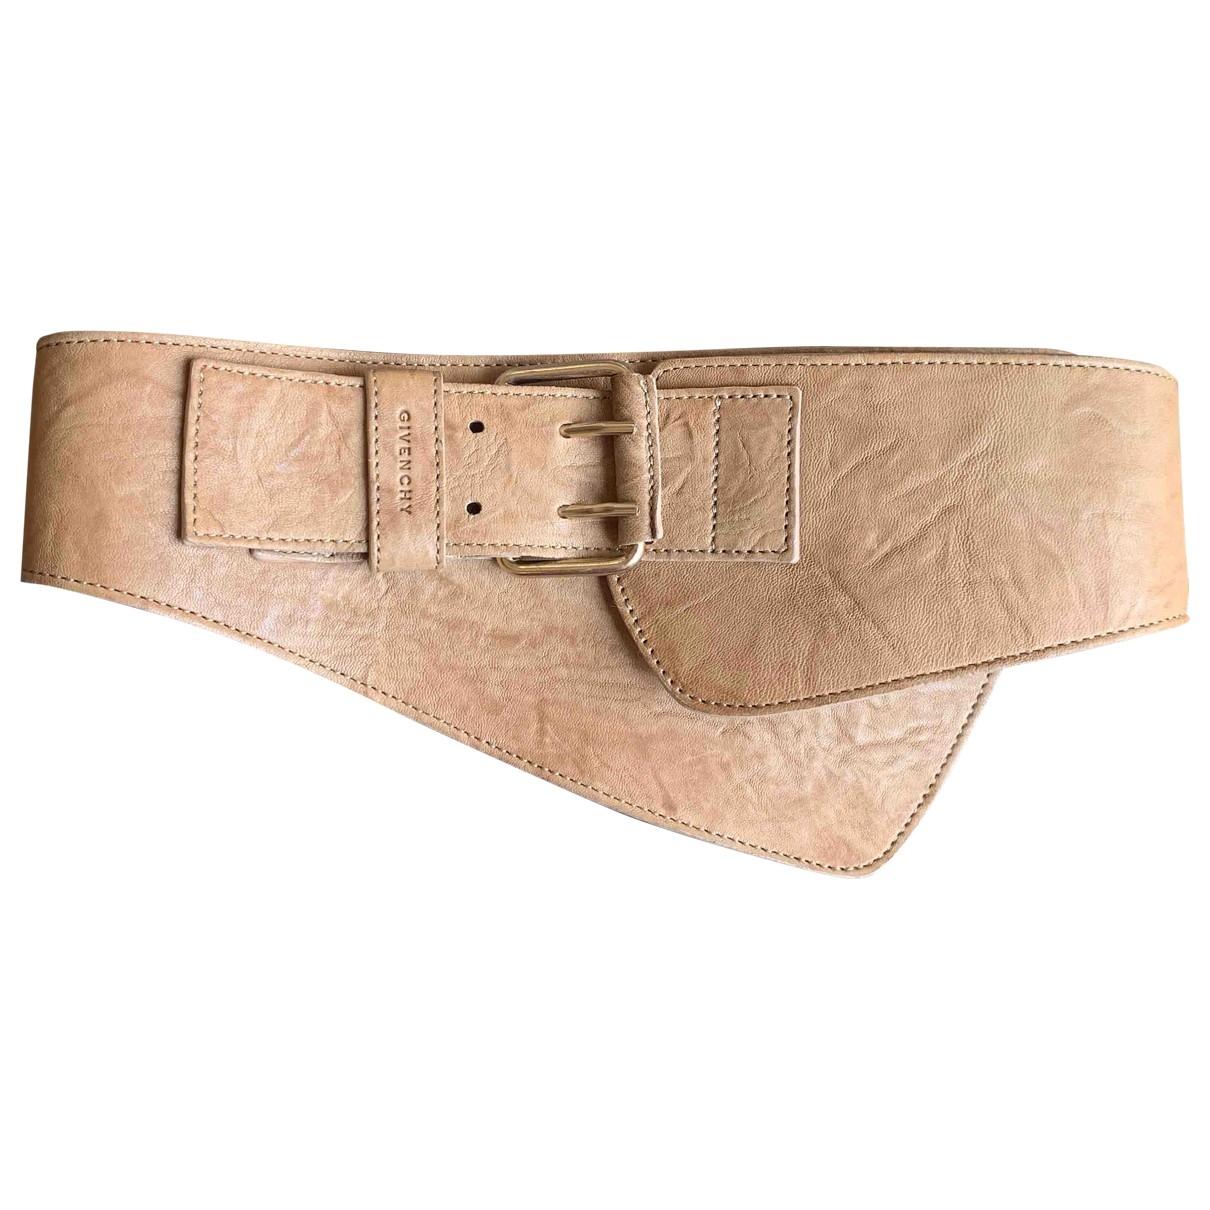 Givenchy \N Beige Leather belt for Women S International